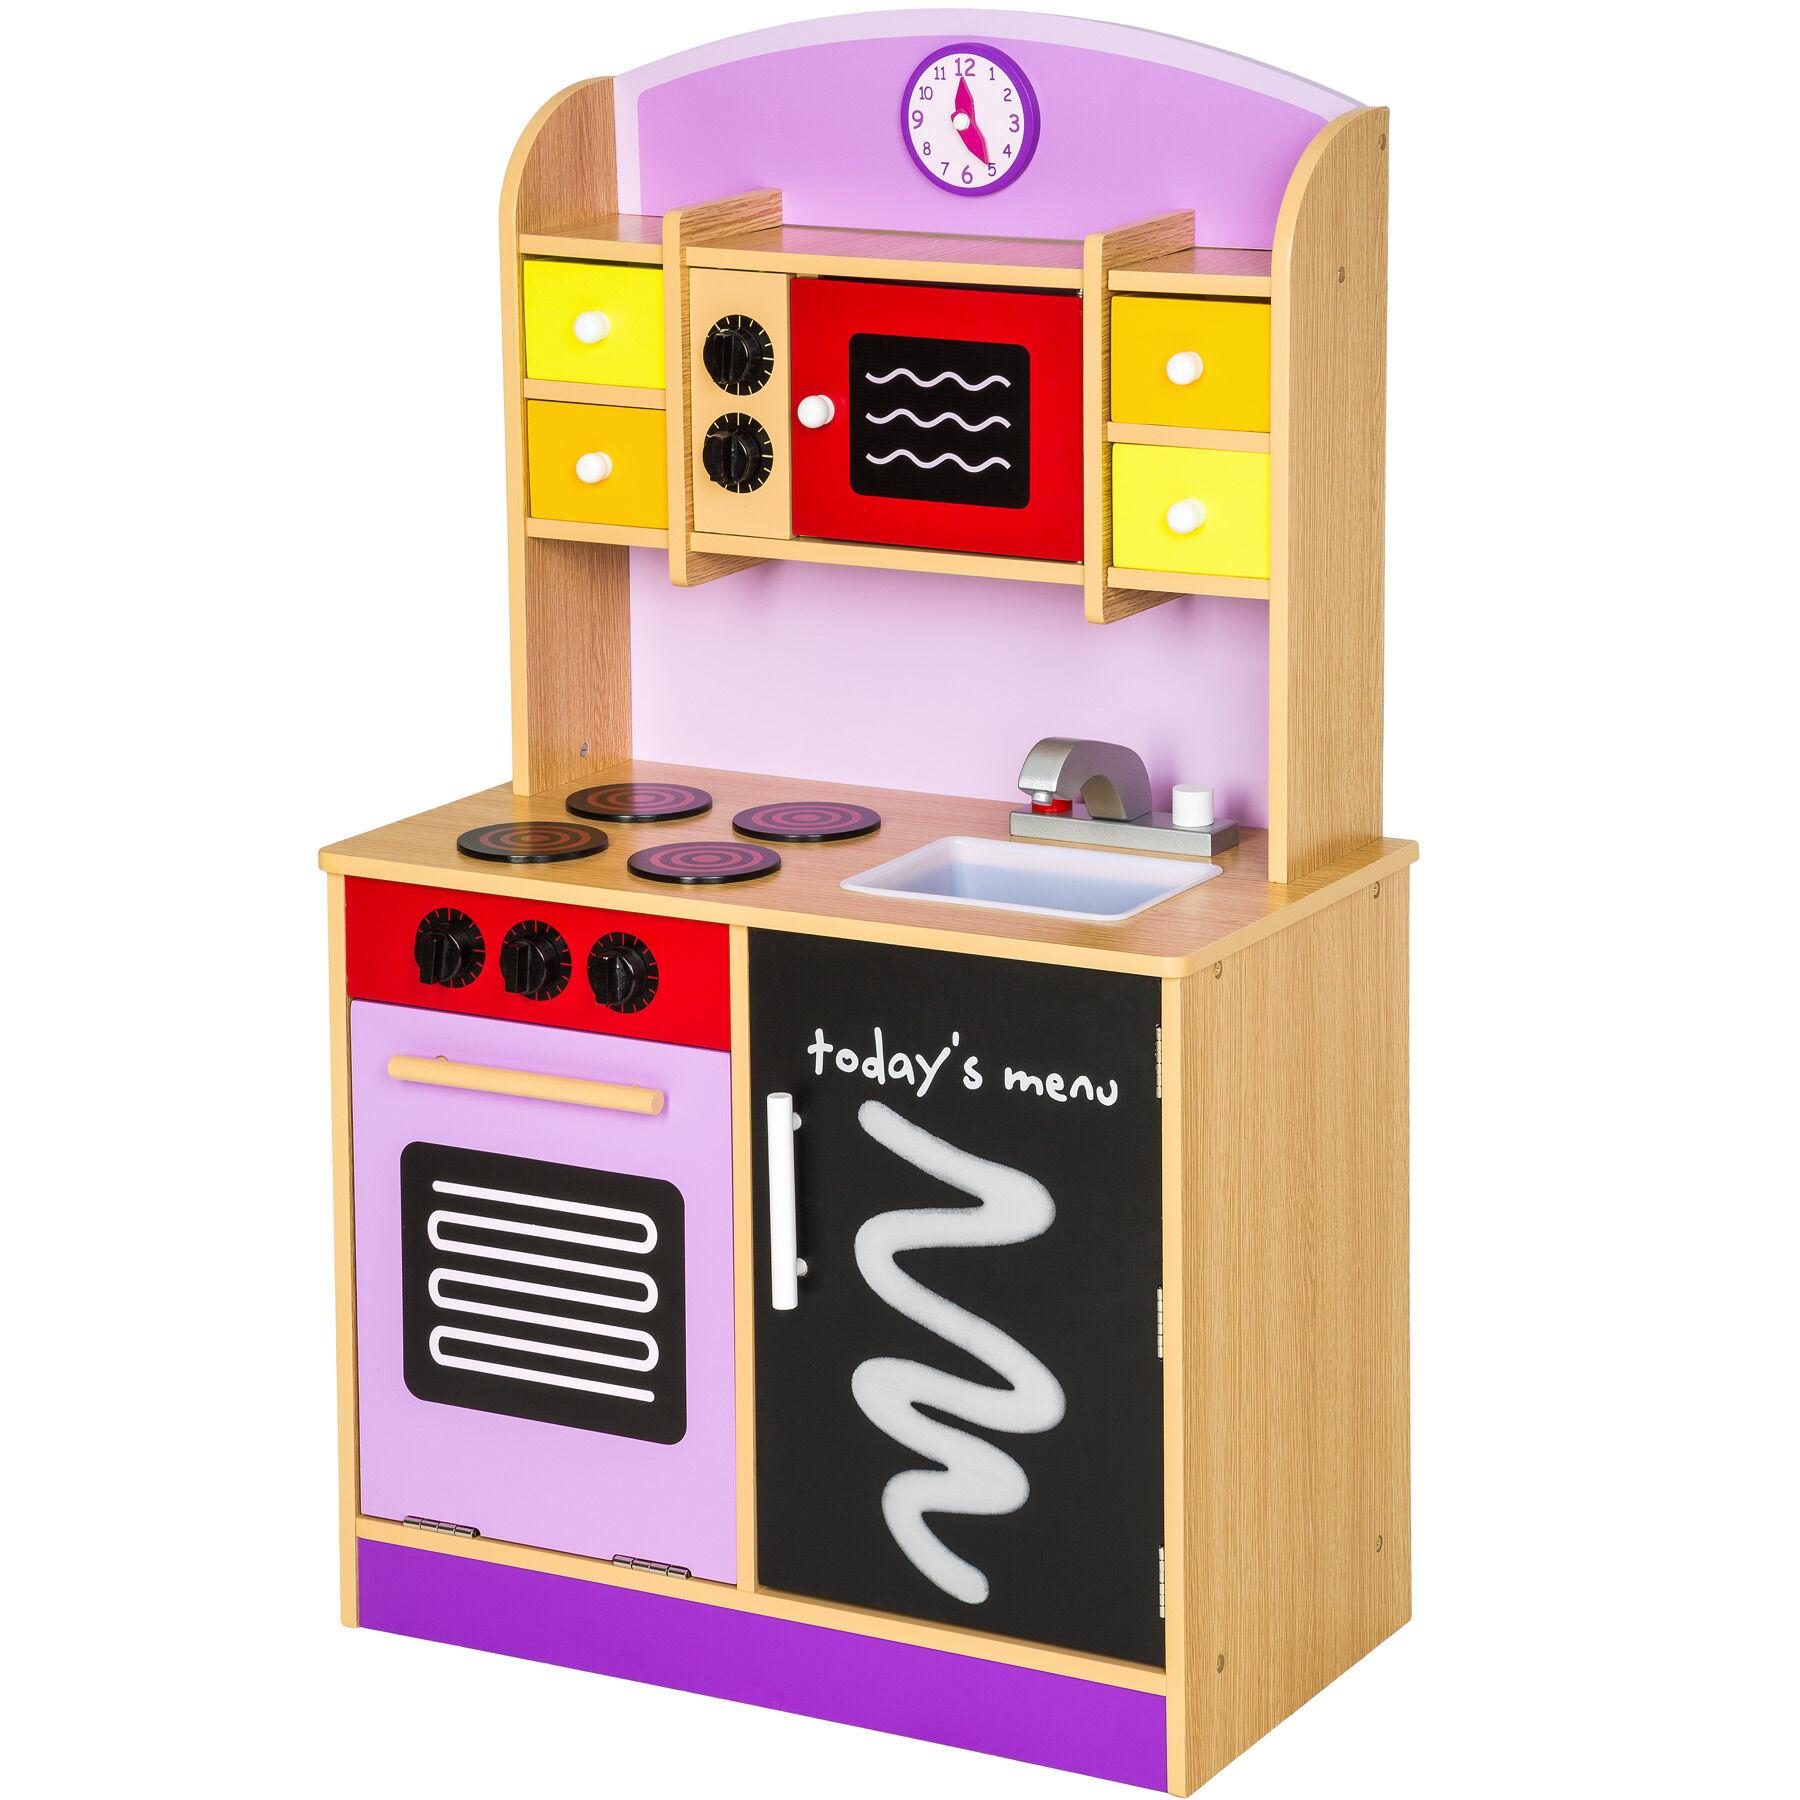 tectake Toy kitchen - purple